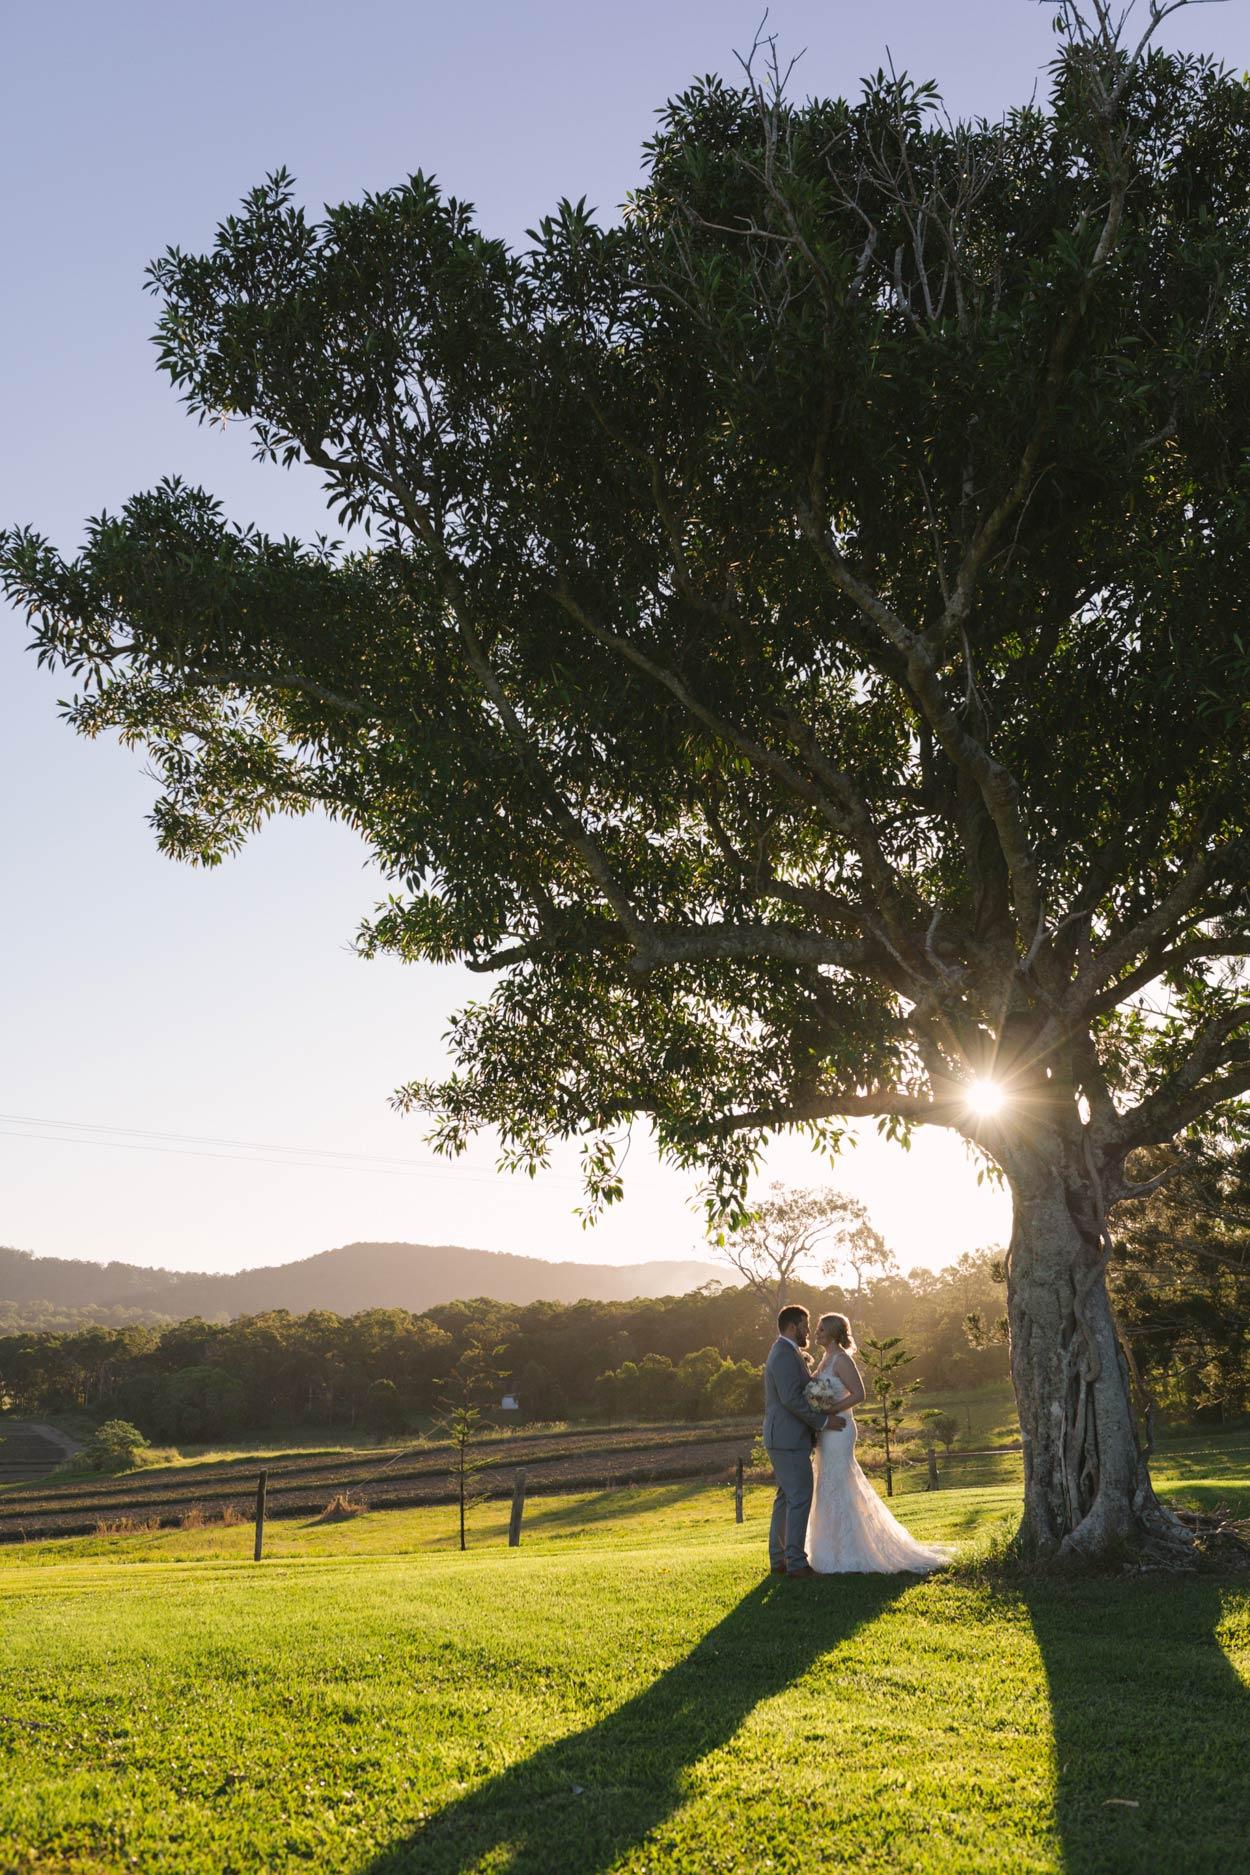 Yandina Station Sunset Pre Wedding Photographers - Brisbane, Sunshine Coast, Australian Destination